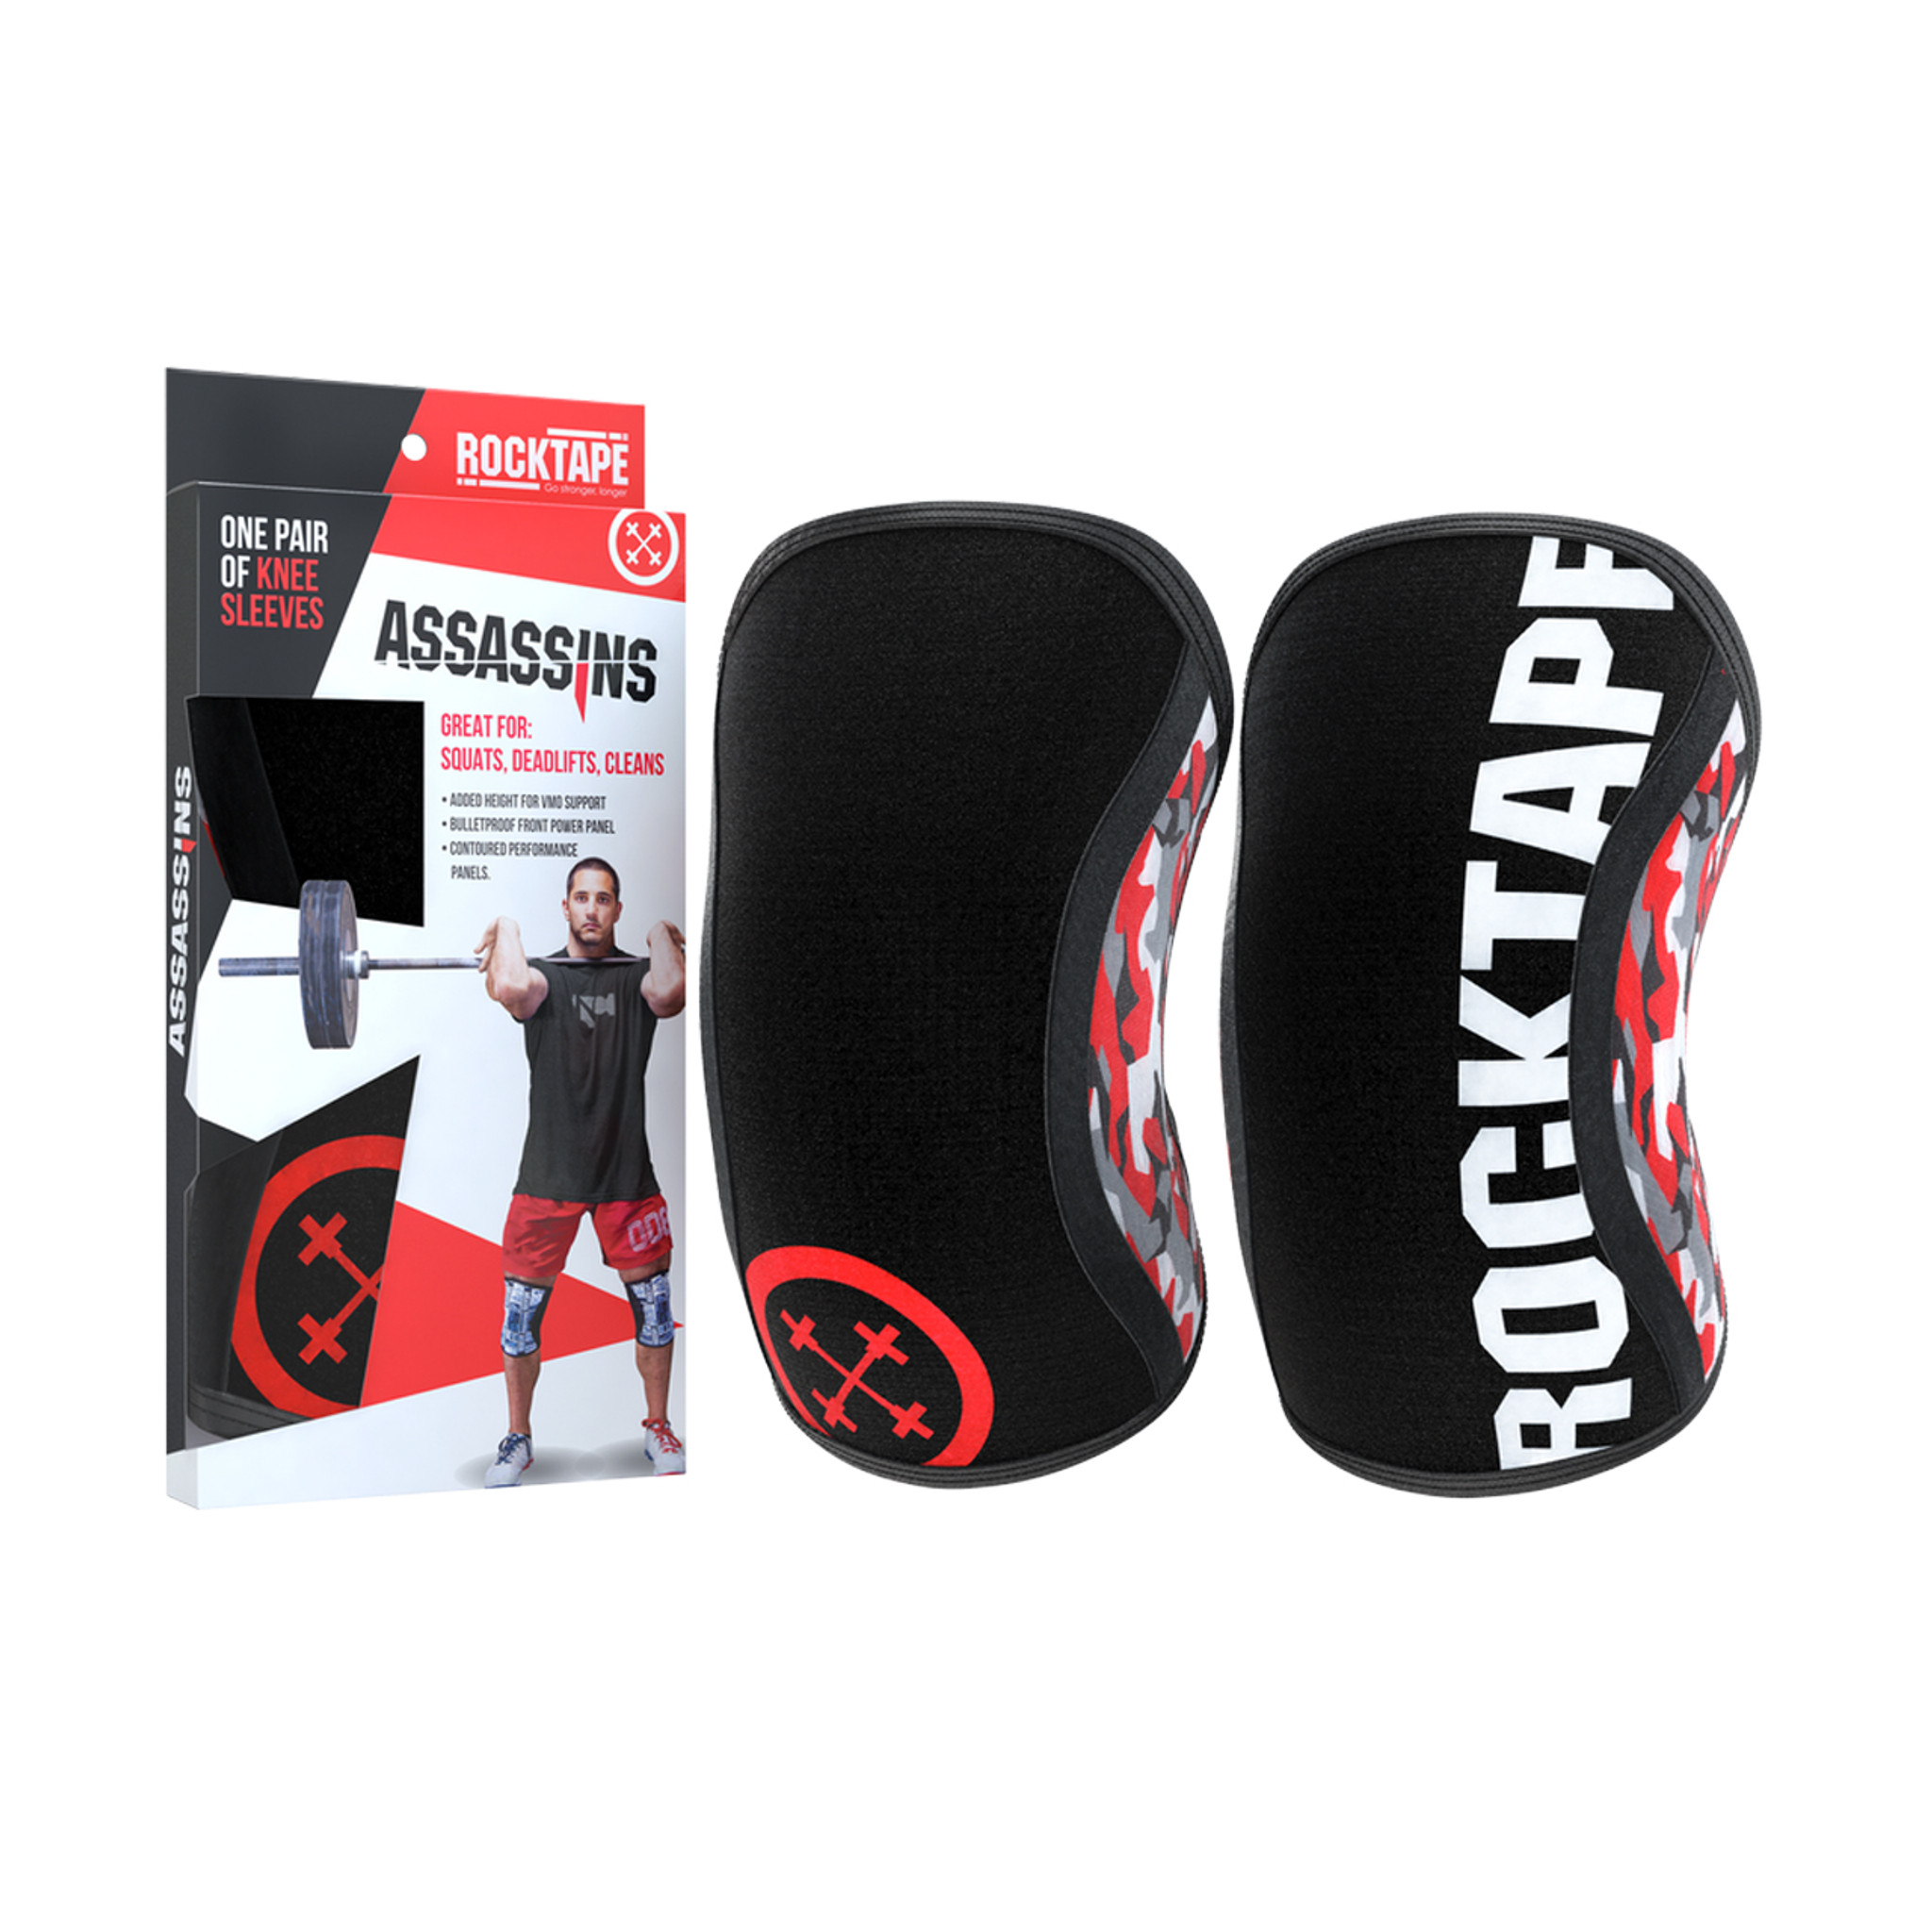 40b05be0ae RockTape Assassins Knee Sleeves - Red Camo